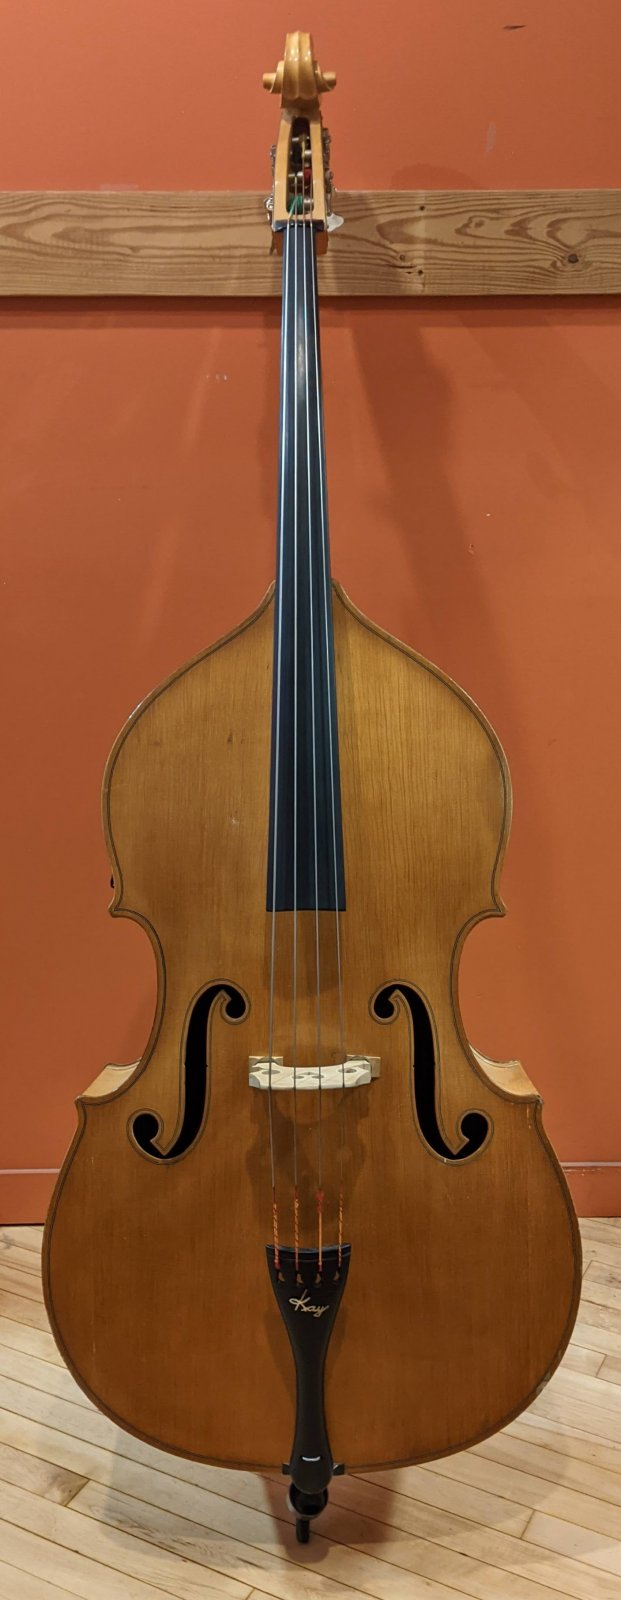 1954 Kay S-9 Swingmaster String Bass